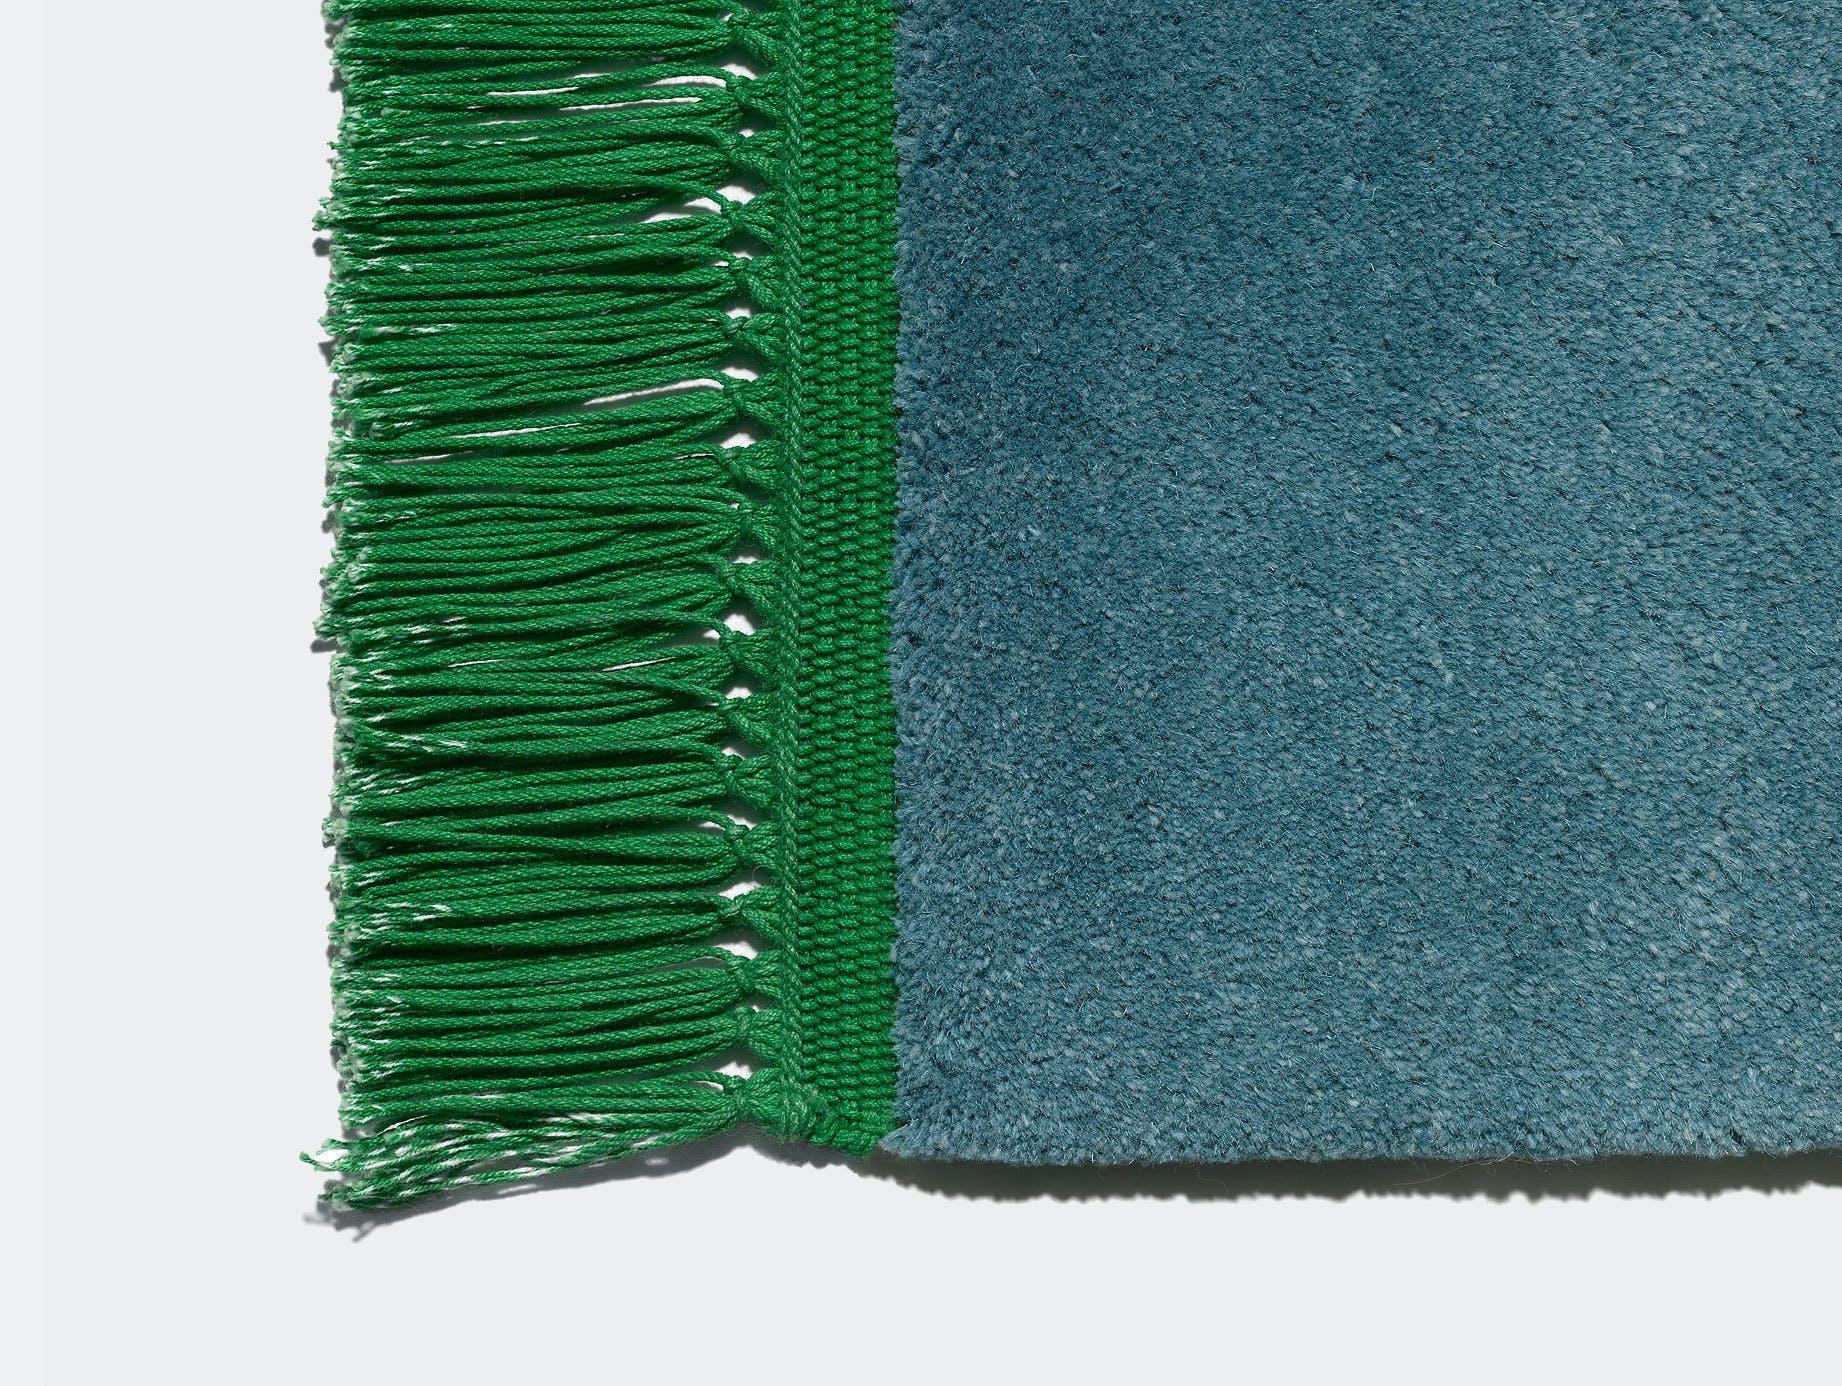 E15 Kavir Rug Ocean Blue Emerald Green Philipp Mainzer Farah Ebrahimi